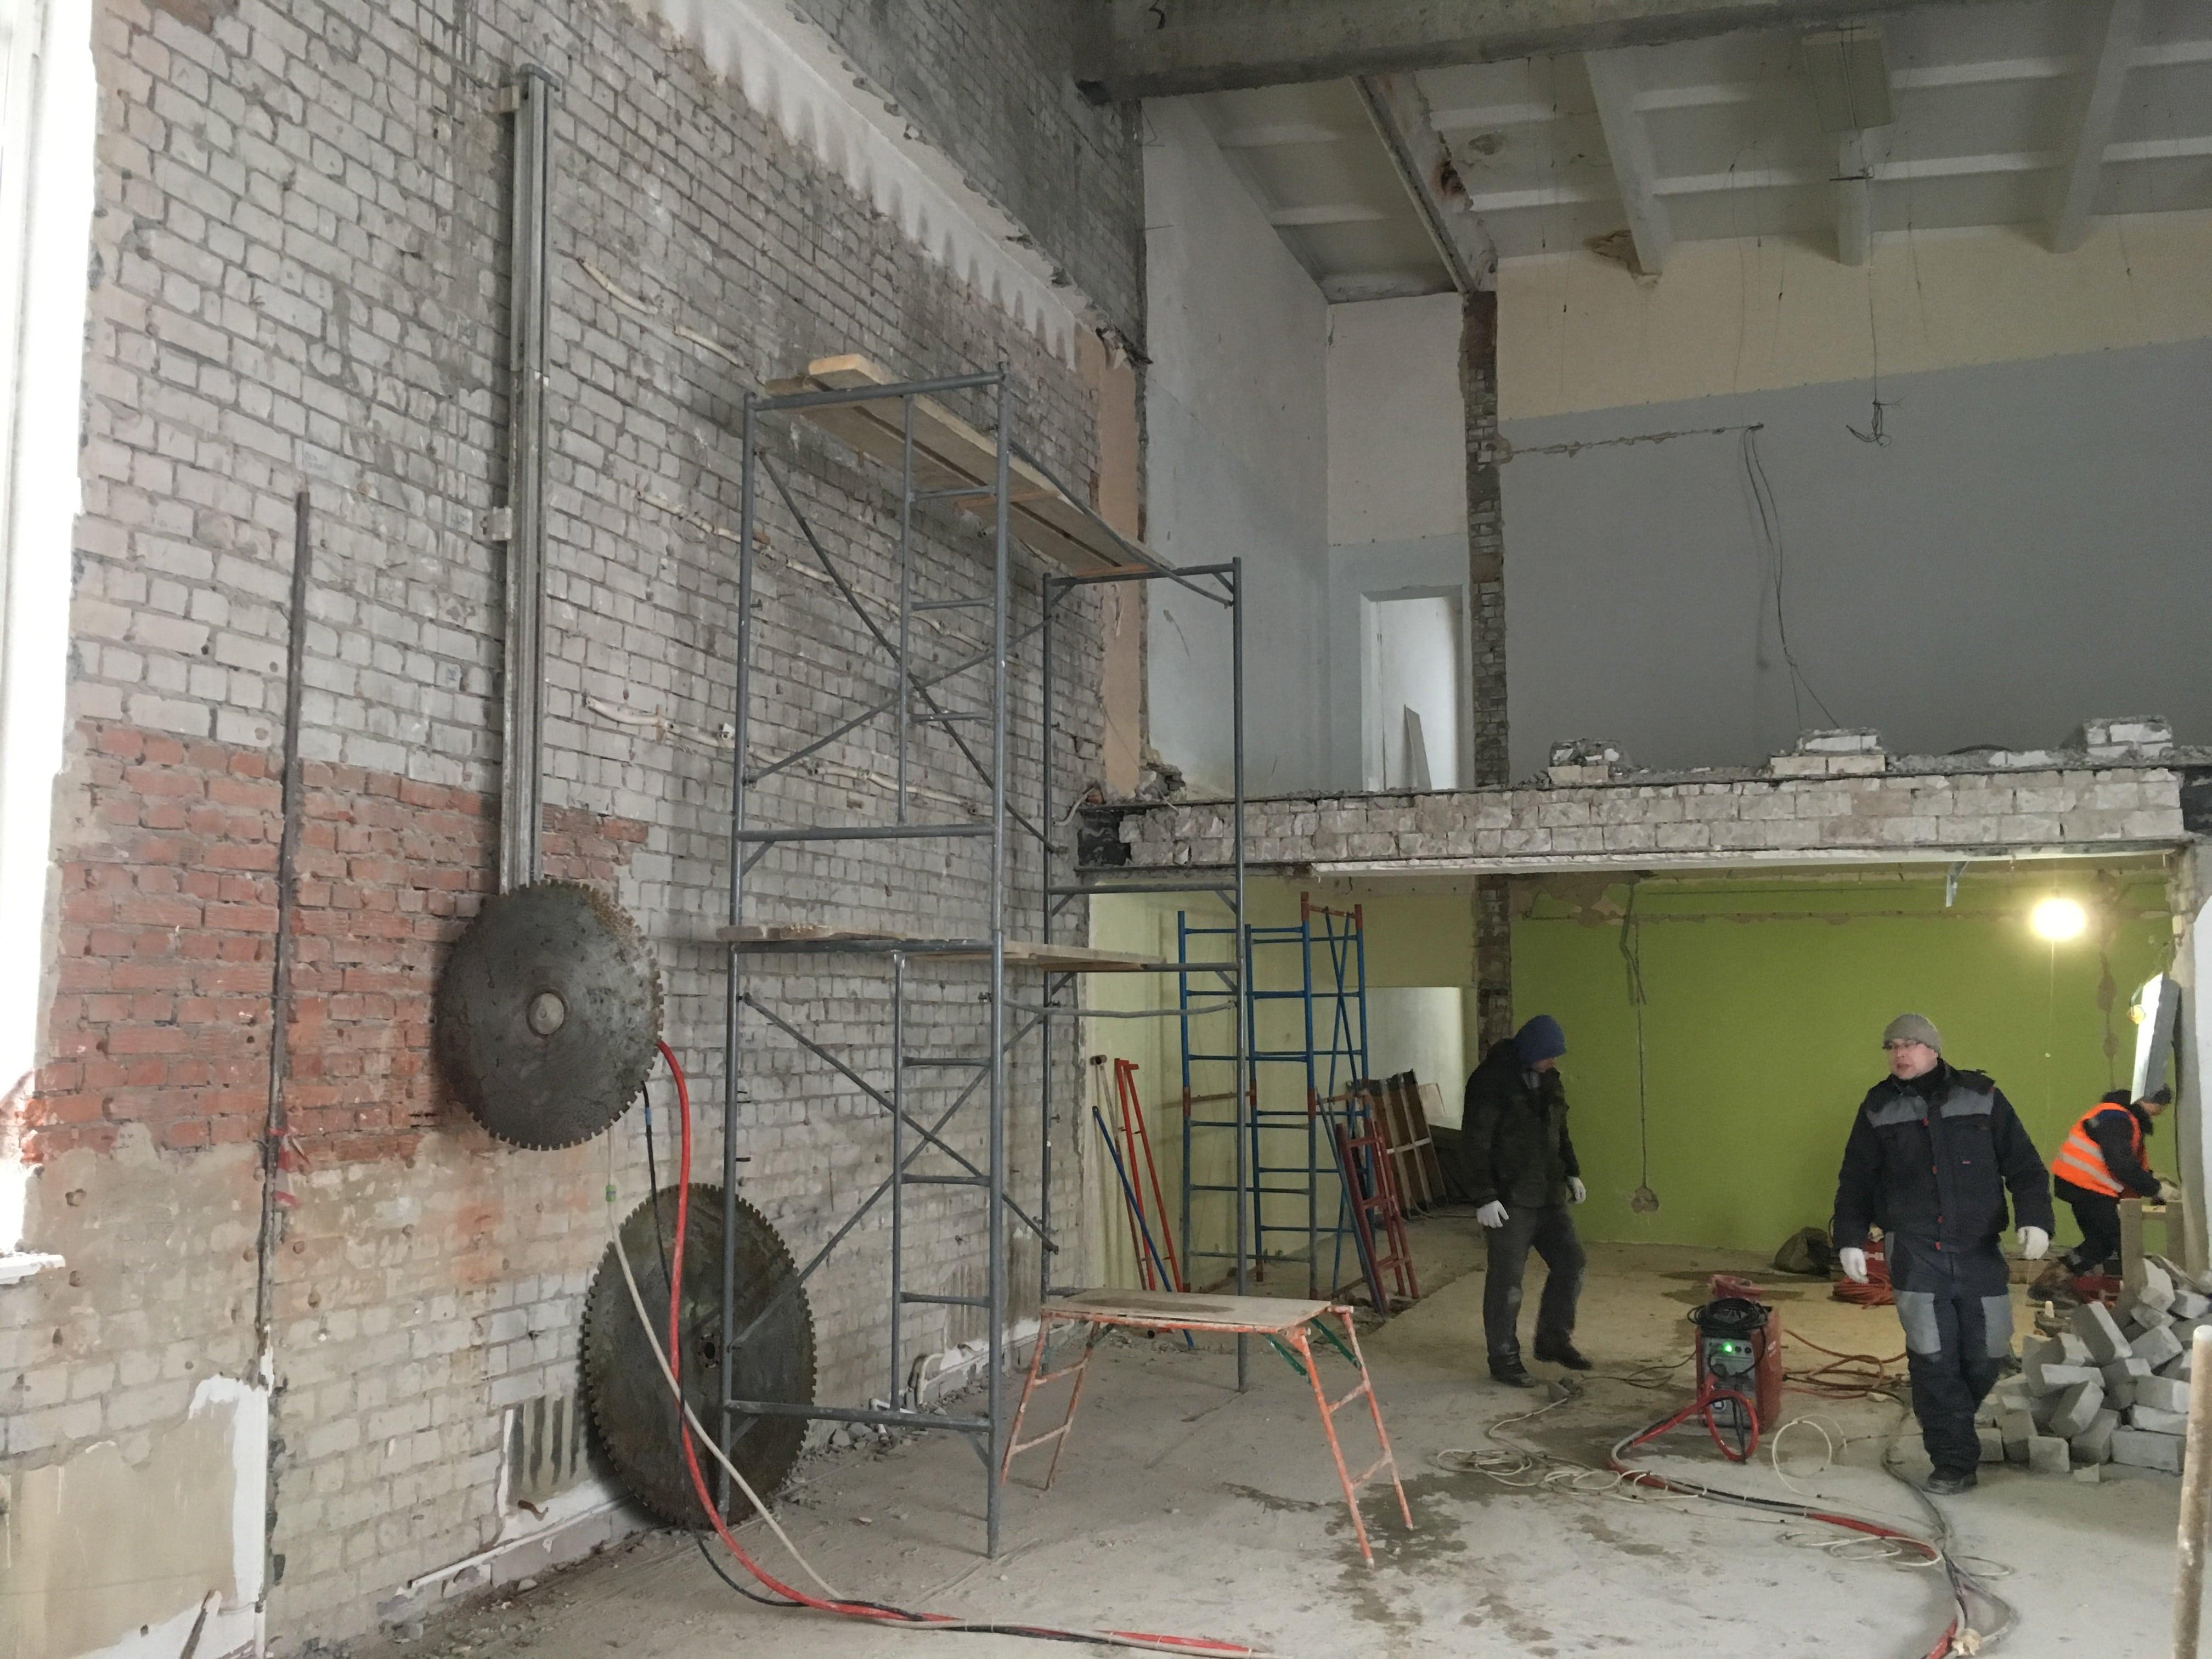 Будущие окна в спортзале в Йошкар-Оле. Алмазная резка, фото